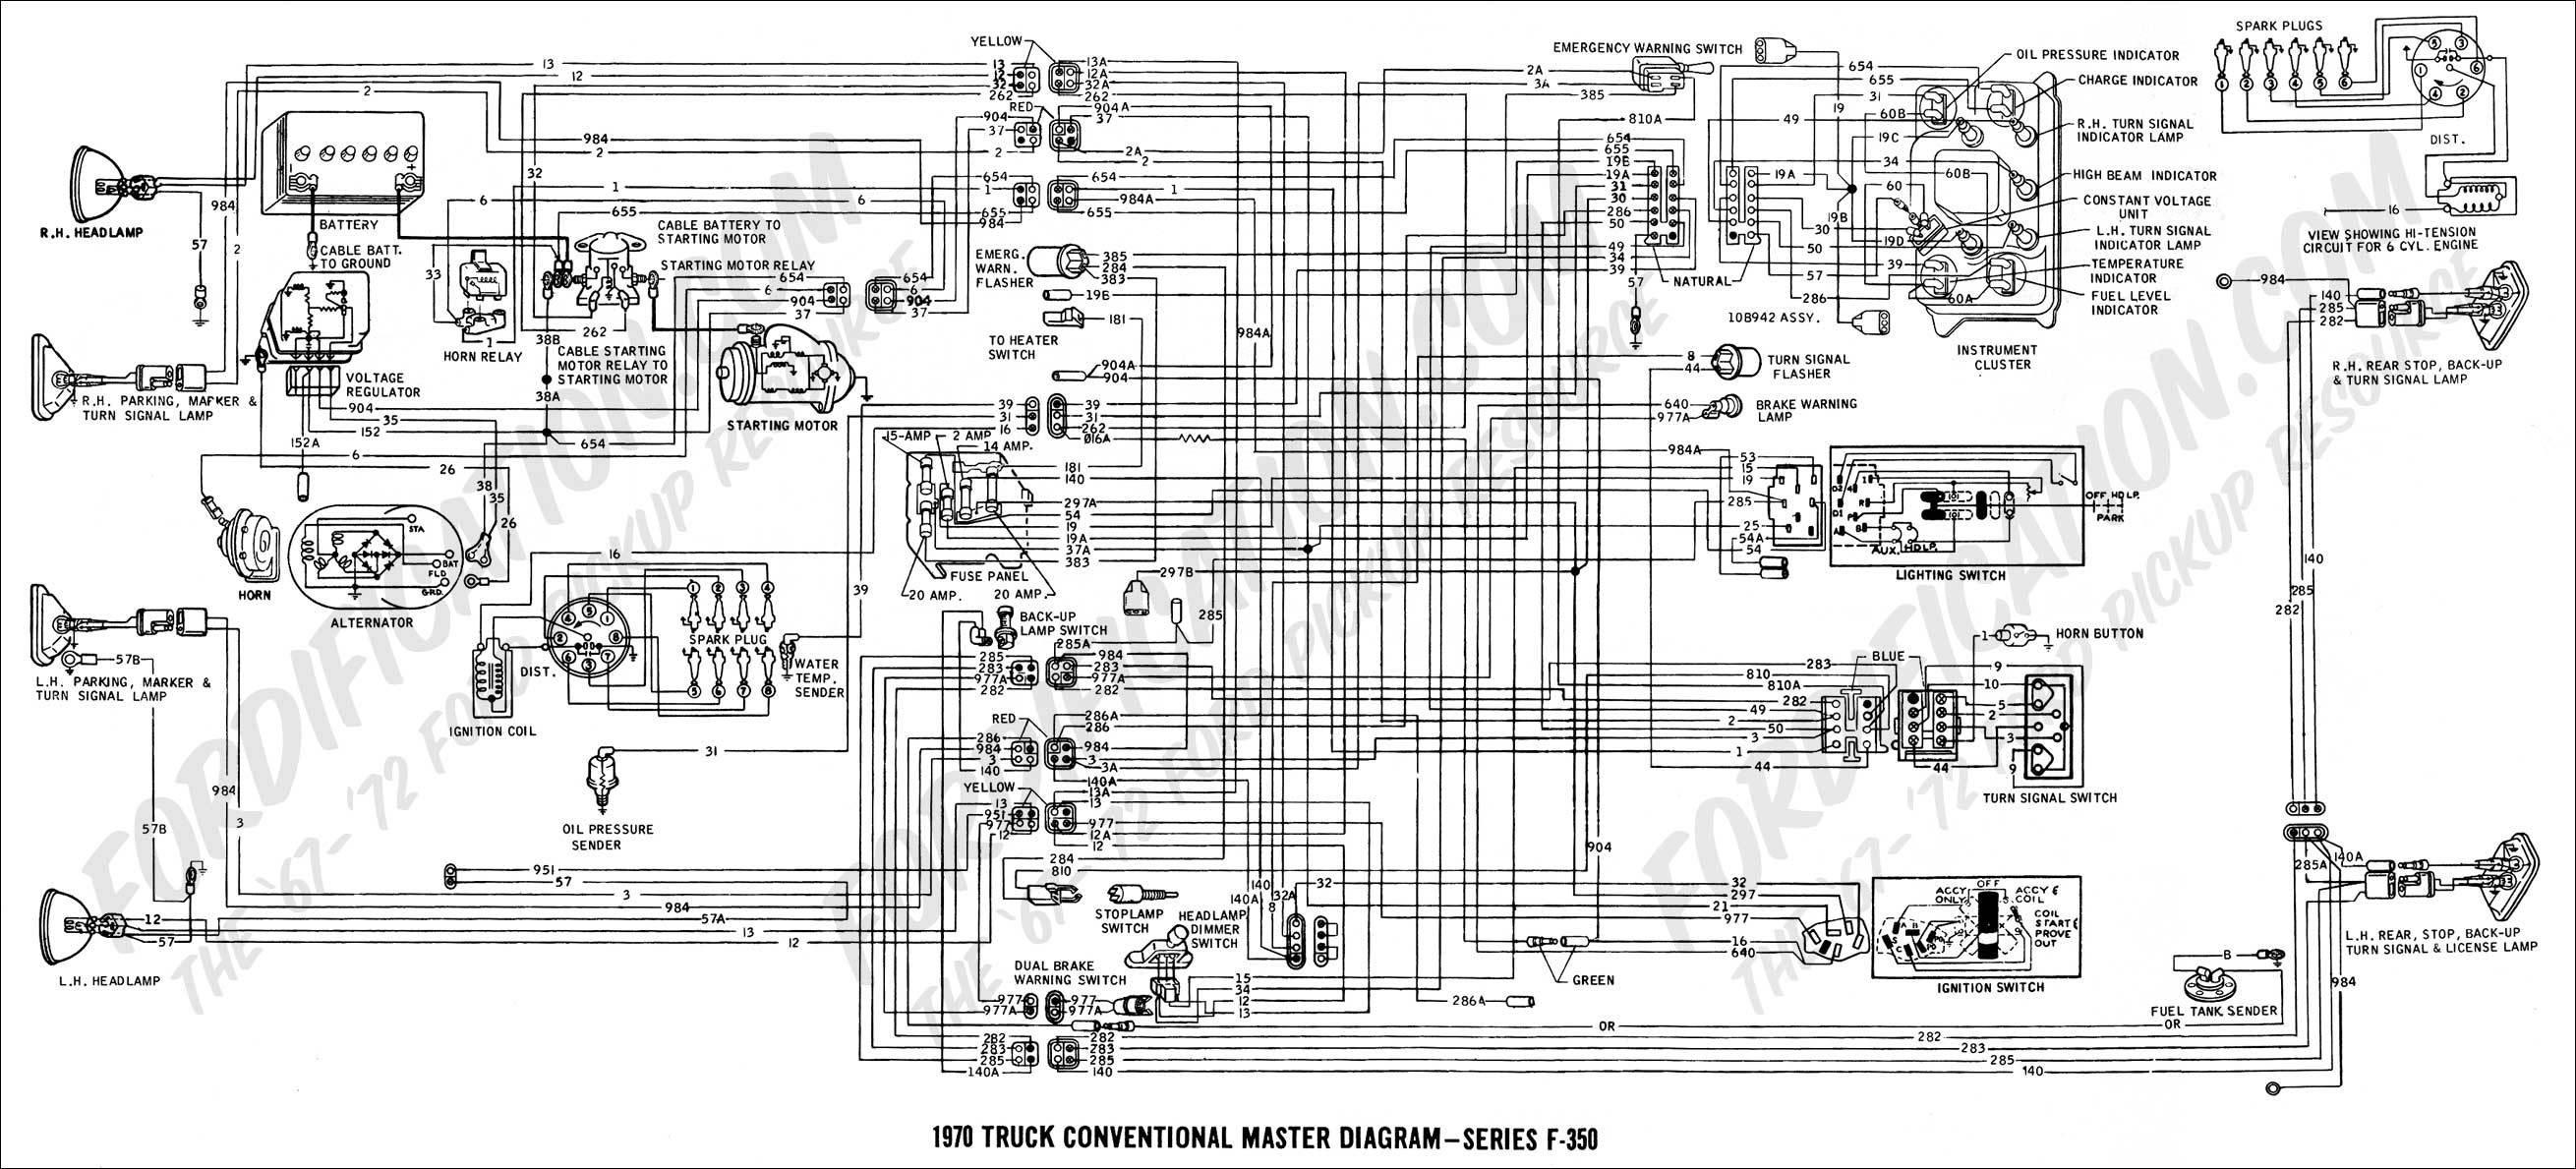 Best Ideas Ford F 350 Wiring Diagram Wiring Diagram In 2005 Ford F550 Trailer